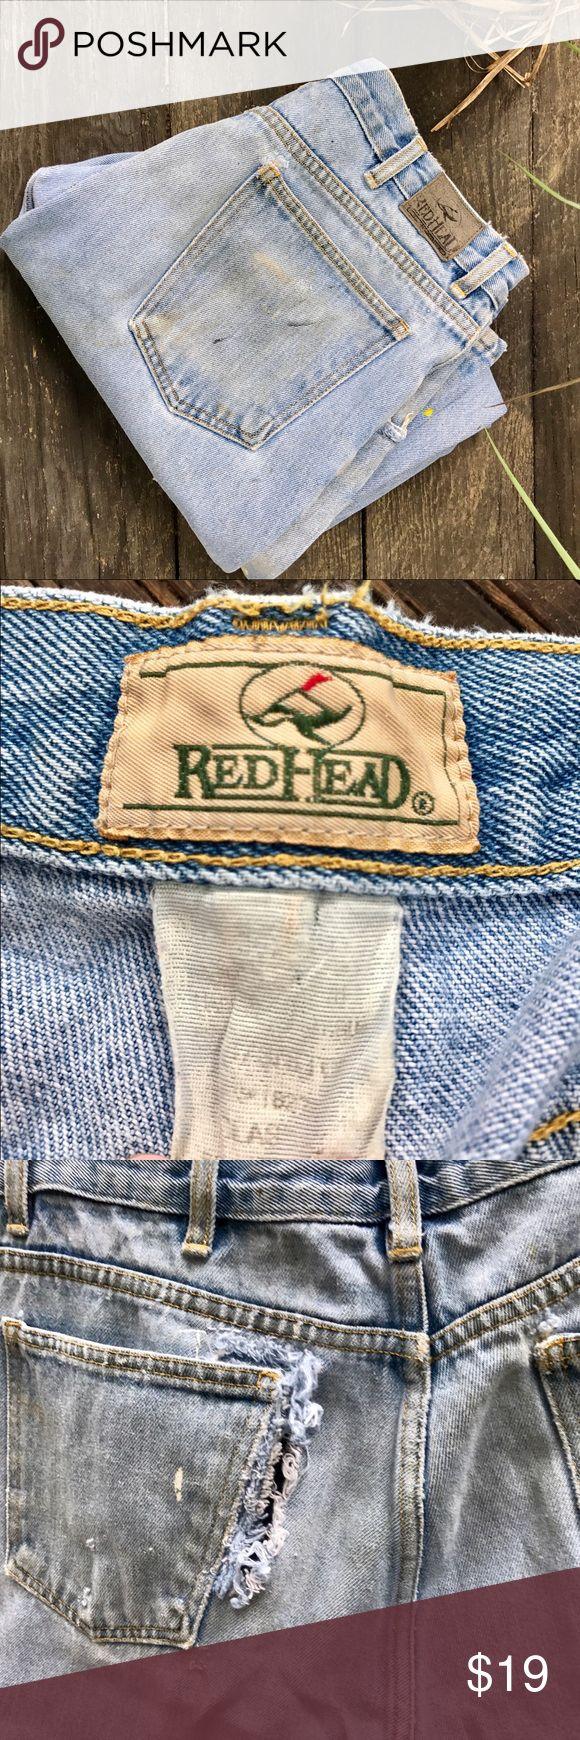 ᴠɪɴᴛᴀɢᴇ ʀᴇᴅʜᴇᴀᴅ ᴅᴇsᴛʀᴏʏᴇᴅ ᴊᴇᴀɴs Vintage Redhead Destroyed Light-wash Jeans. They have been worn out and have holes. Will need patchwork. Vintage Jeans